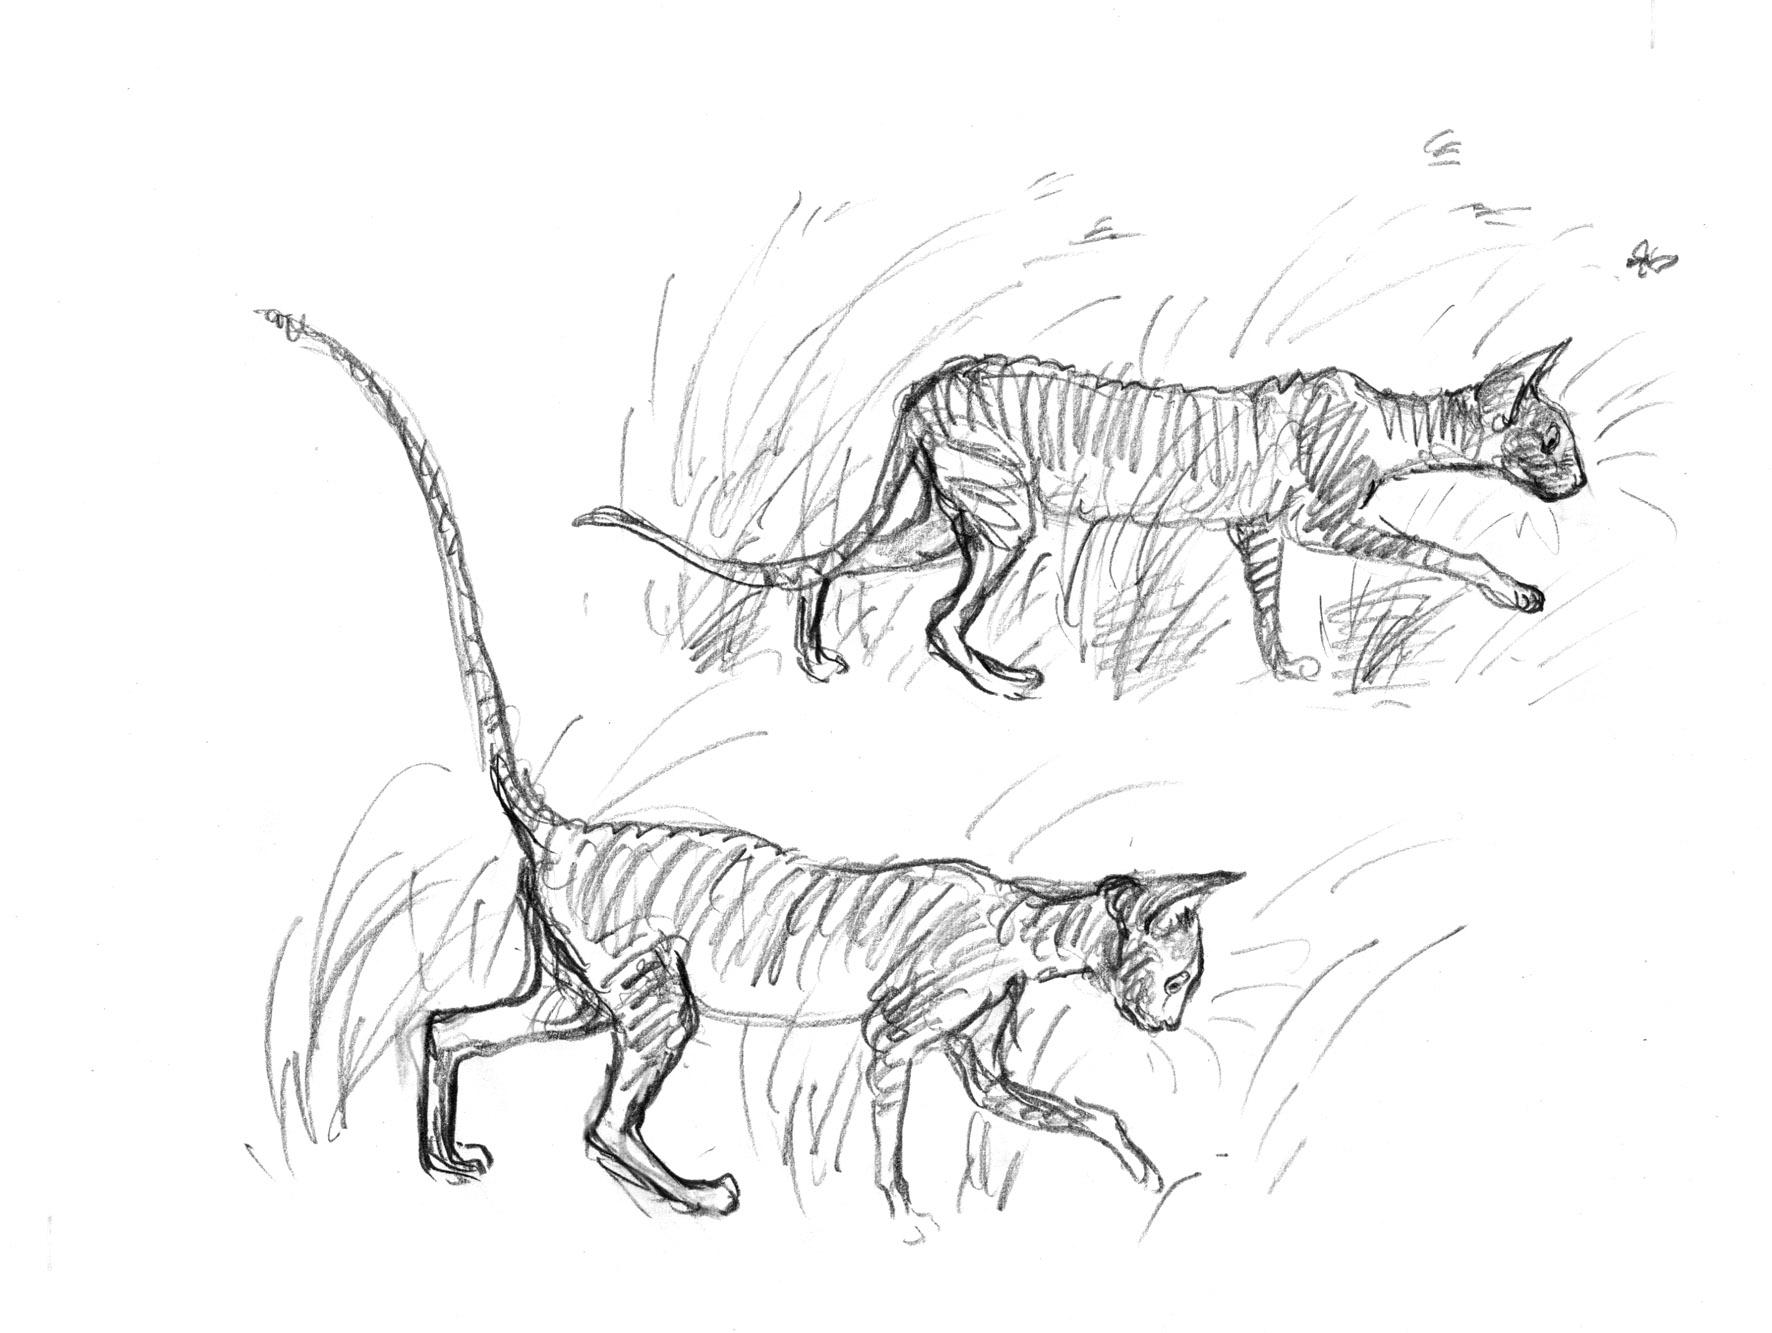 cornish cats in the grass judywatsonart lores